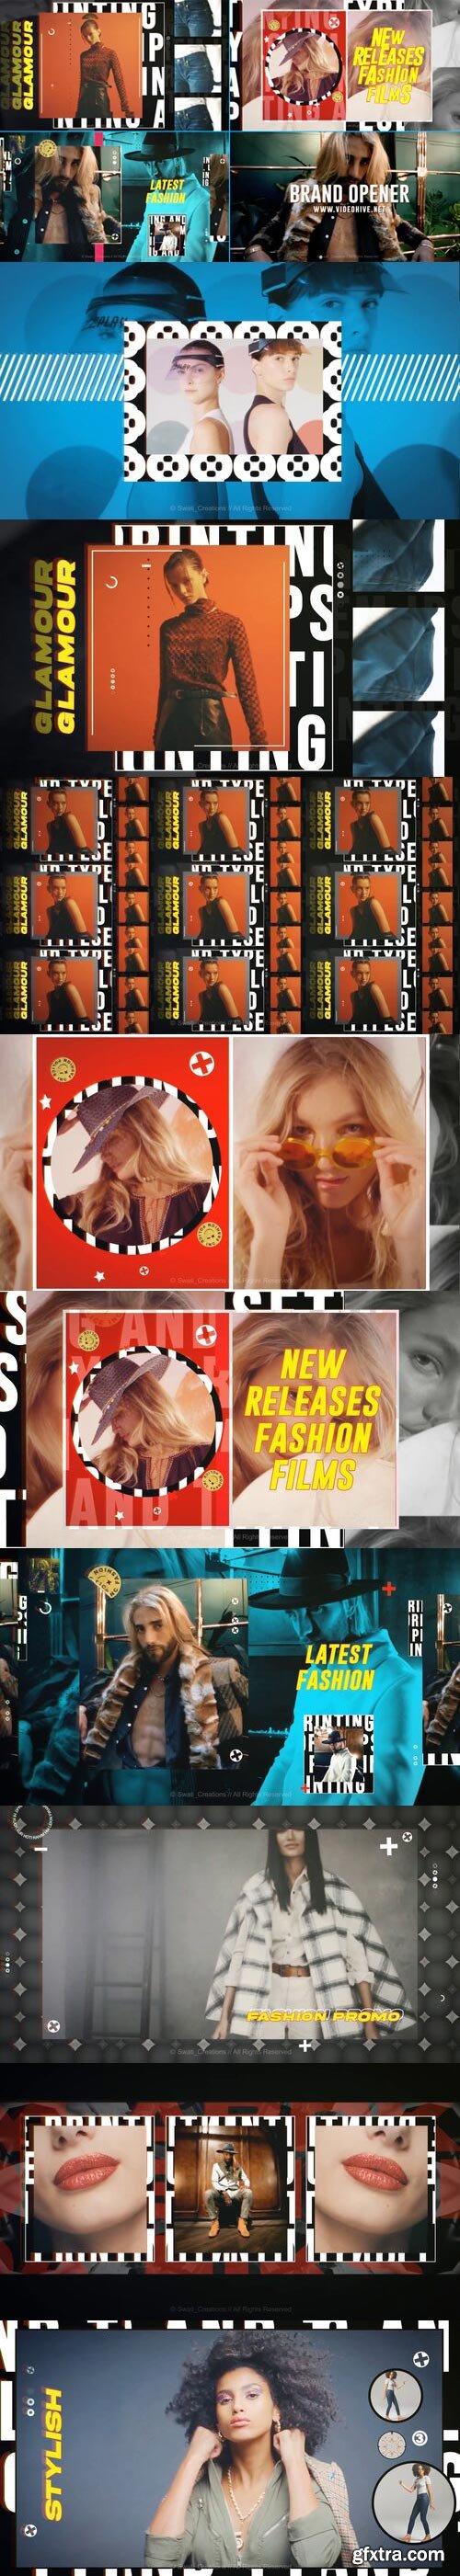 Videohive - Fashion Brand Opener - 29915784